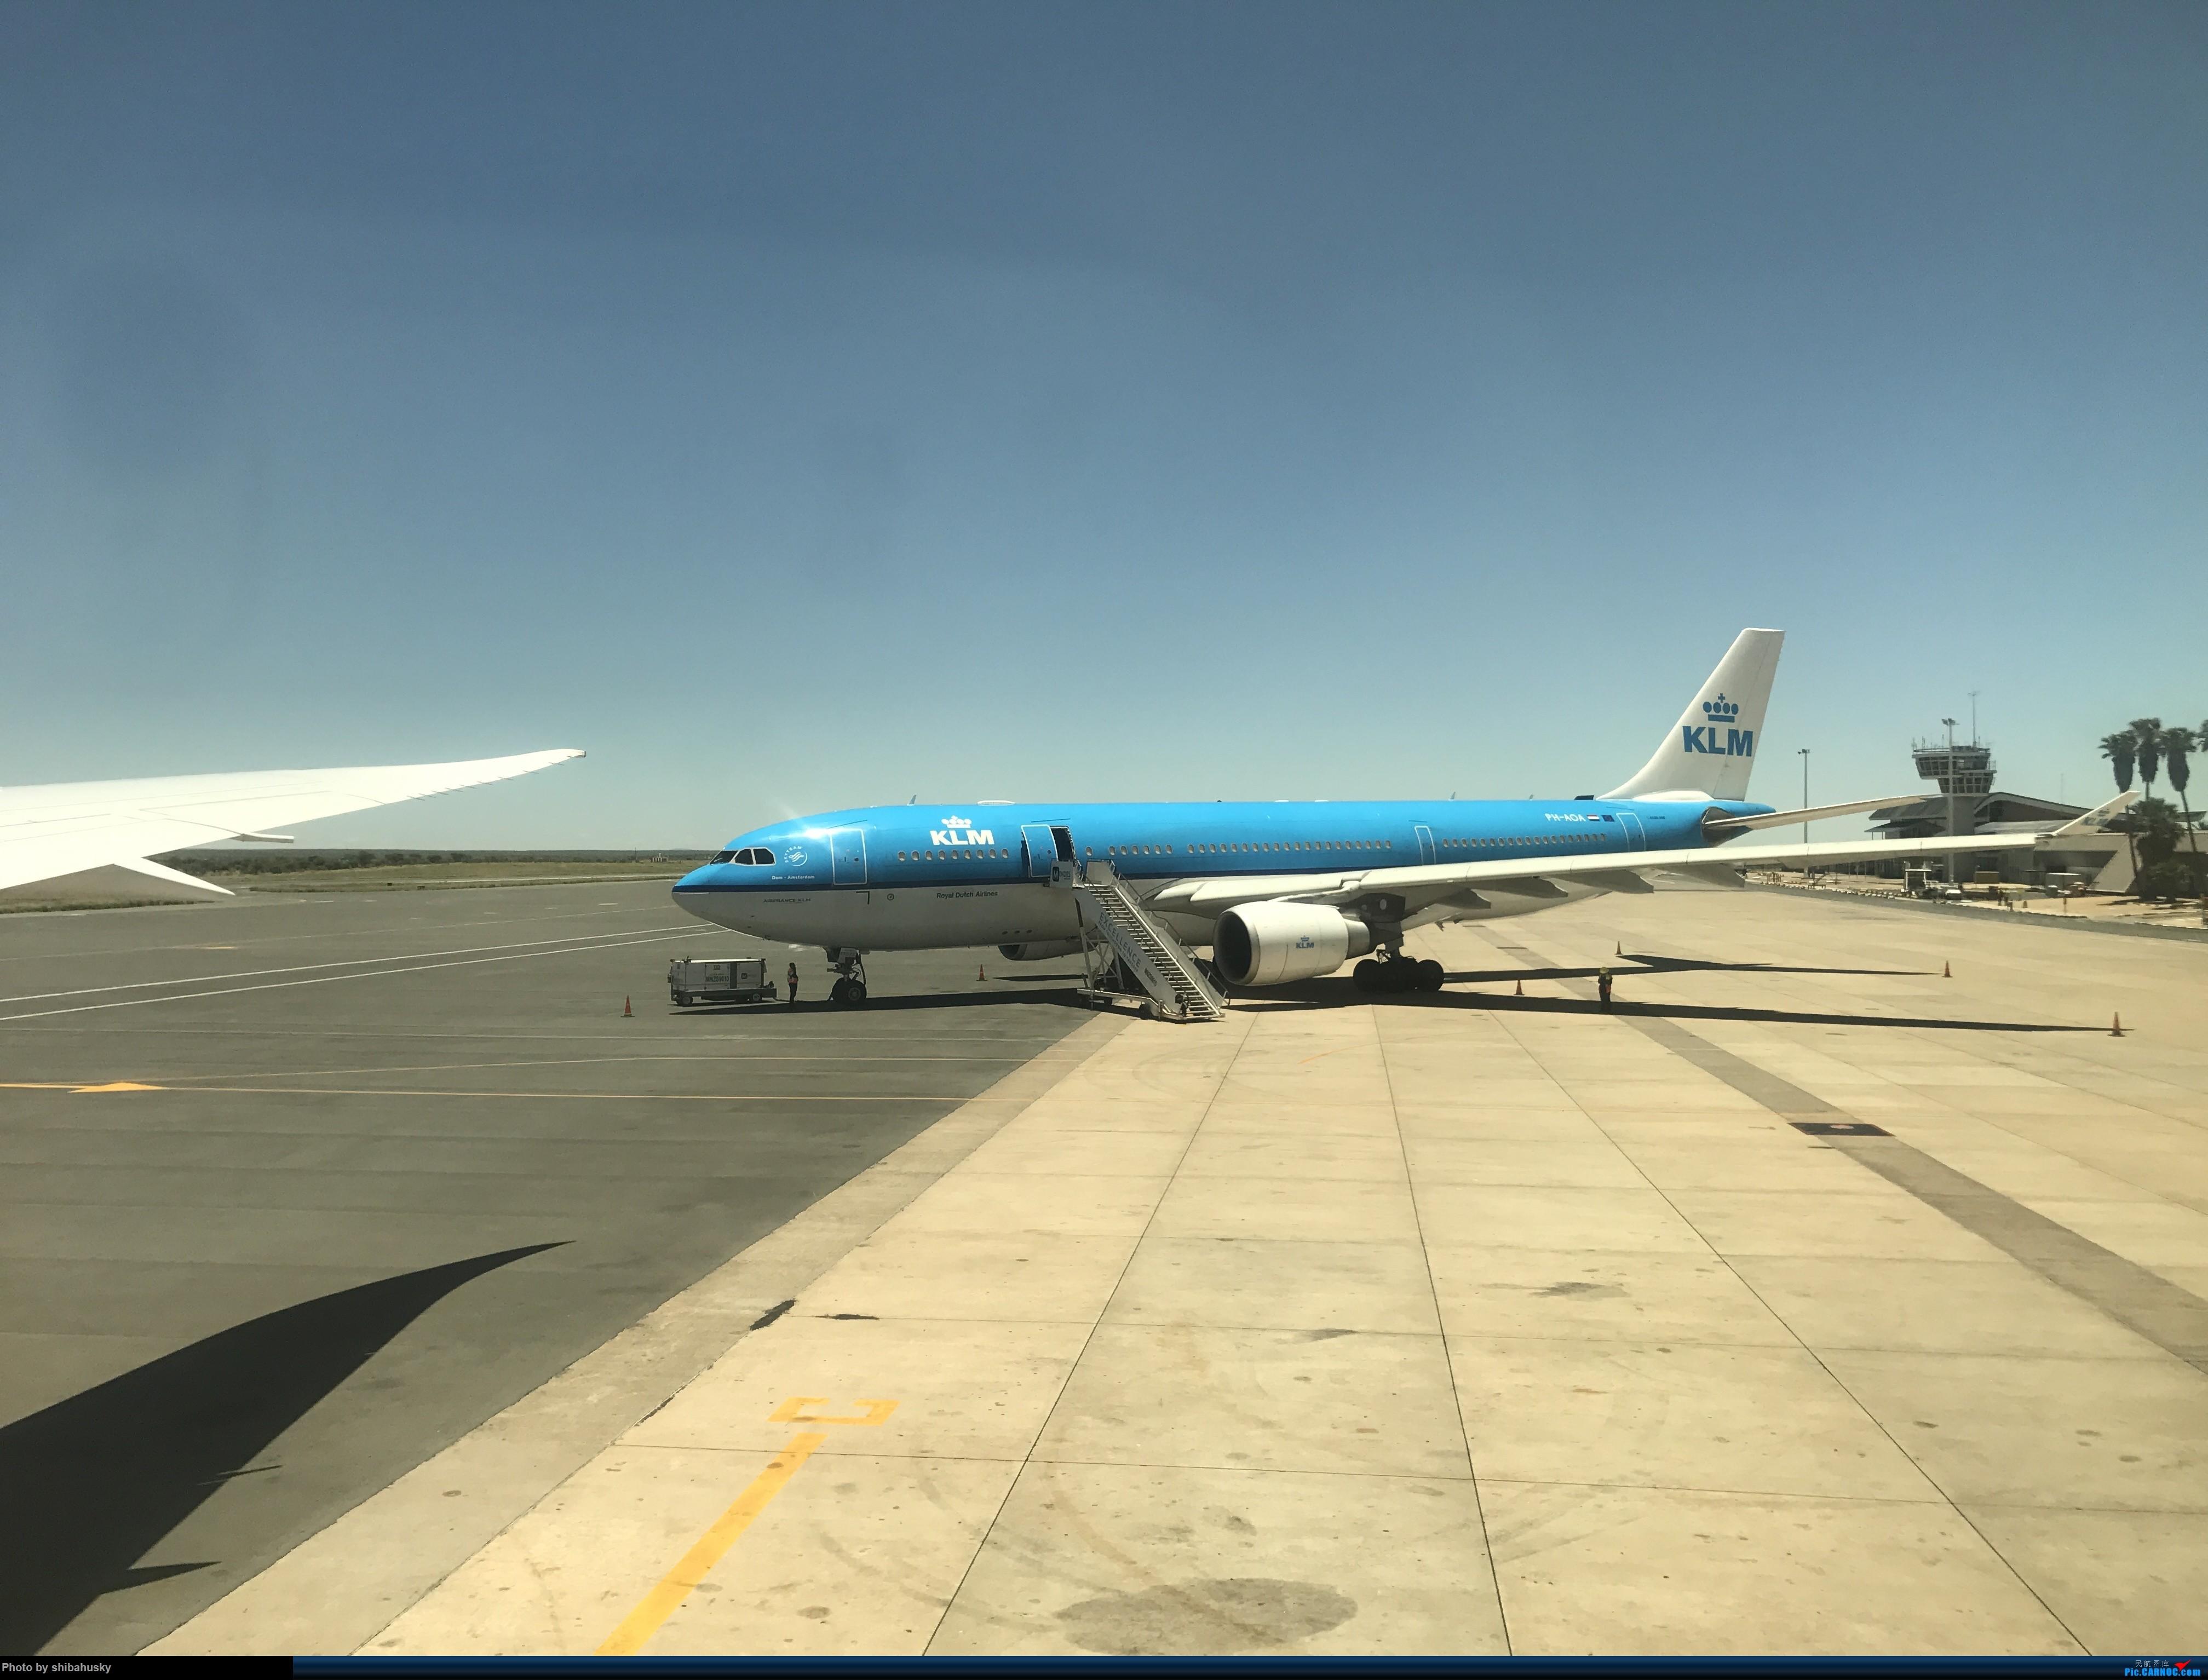 Re:[原创]新人第一帖 WVB-WDH-DOH-CDG-SOU 圣诞纳米比亚游记 体验稀有机型加辗转回英 AIRBUS A320-200 PH-AOA 温得和克国际机场